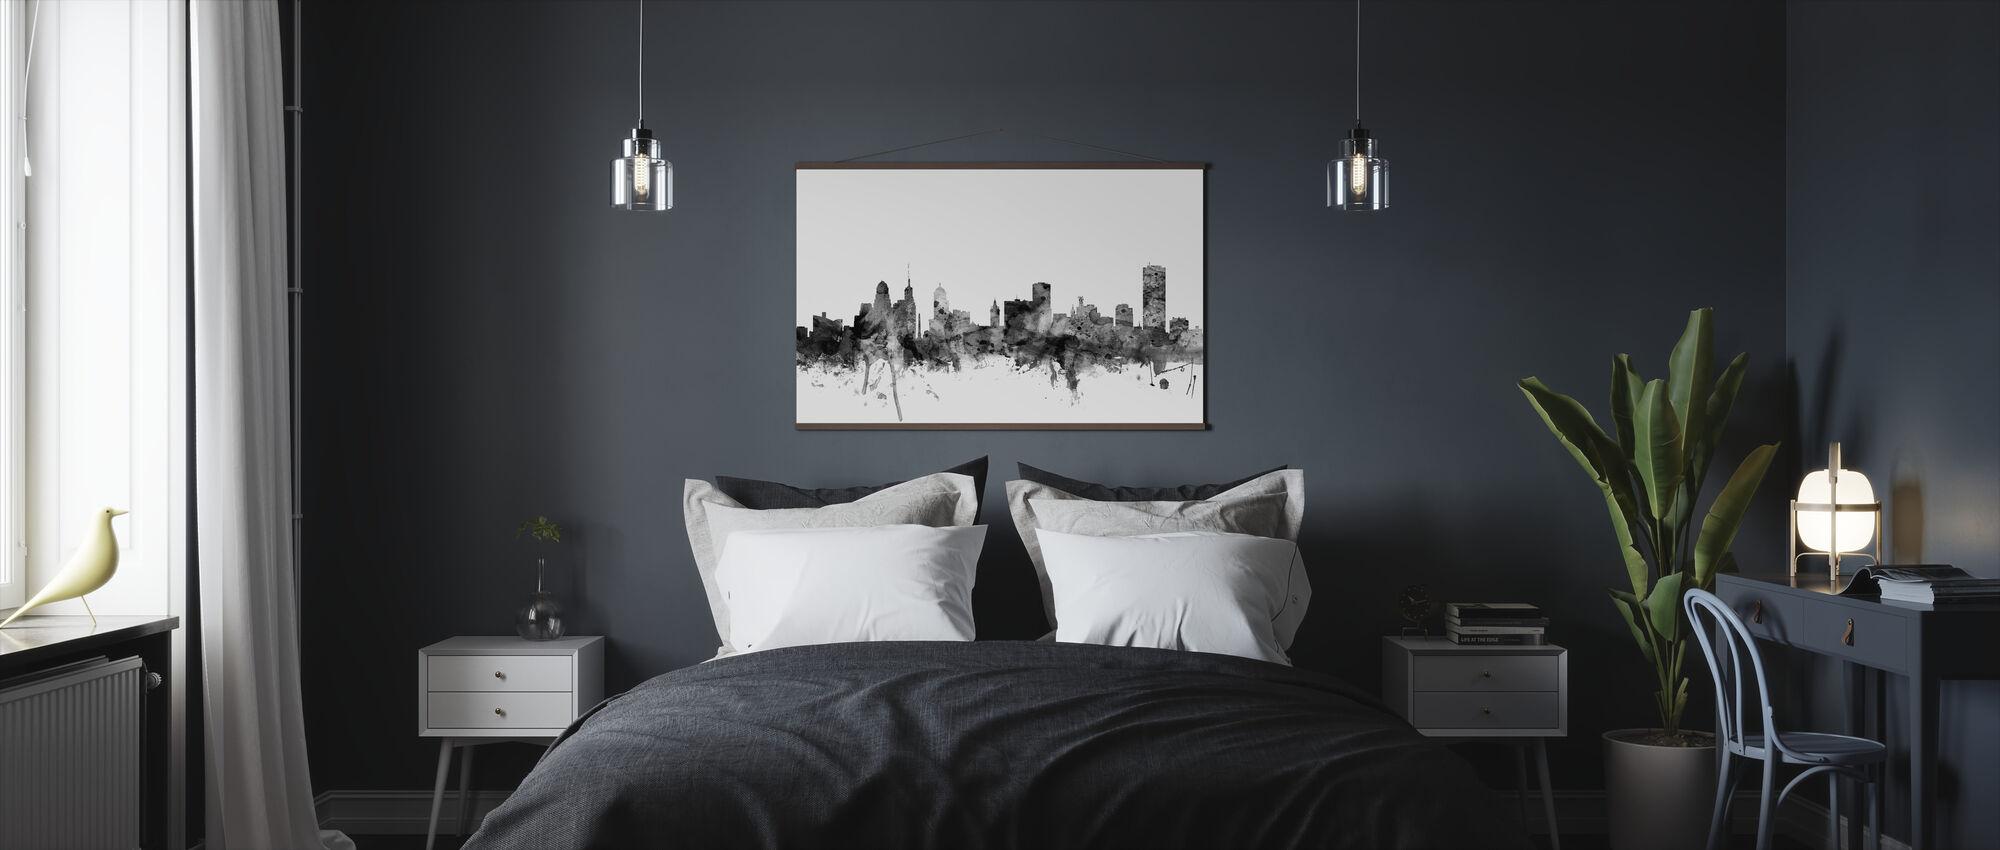 Buffalo New York Skyline Zwart - Poster - Slaapkamer